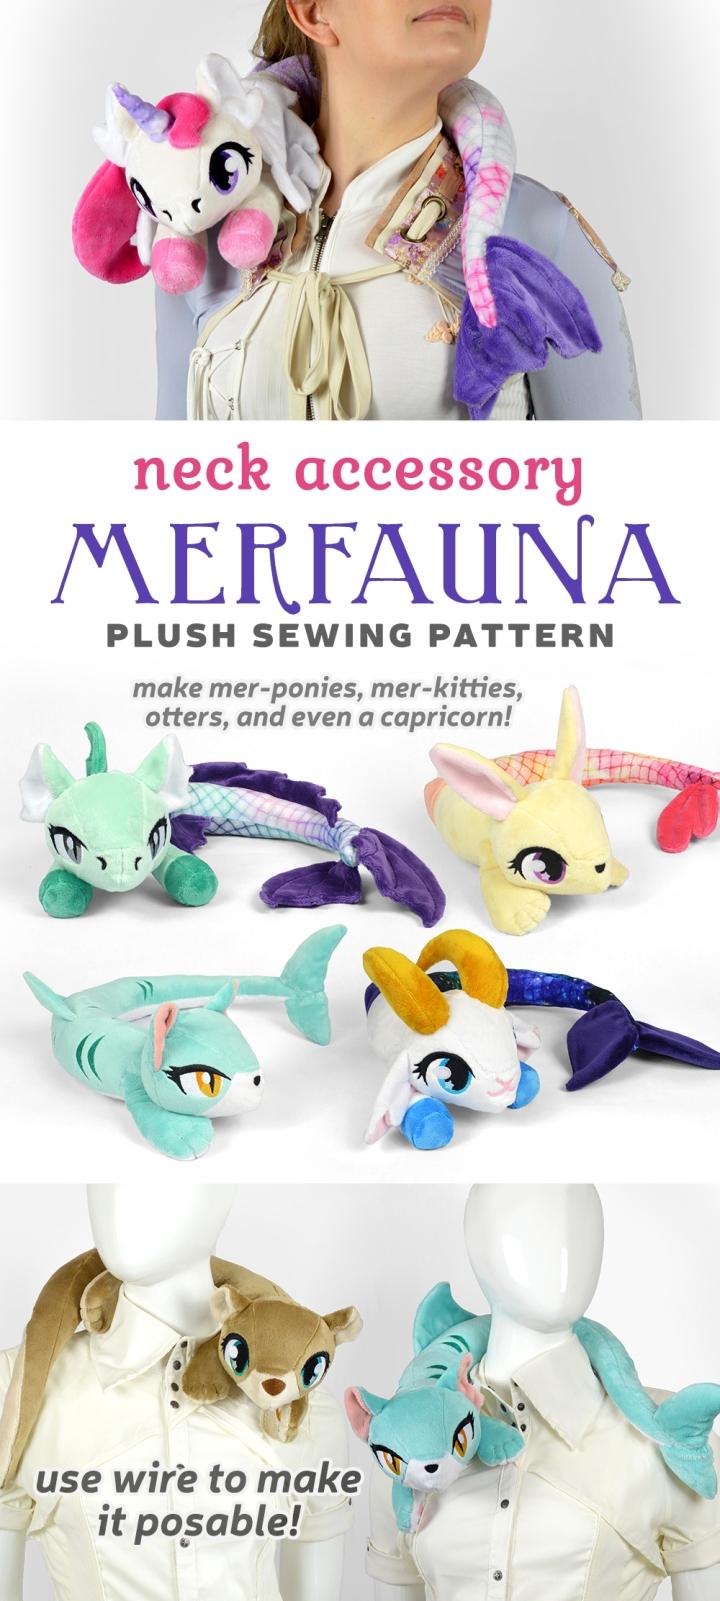 Neck Merfauna Blog Title